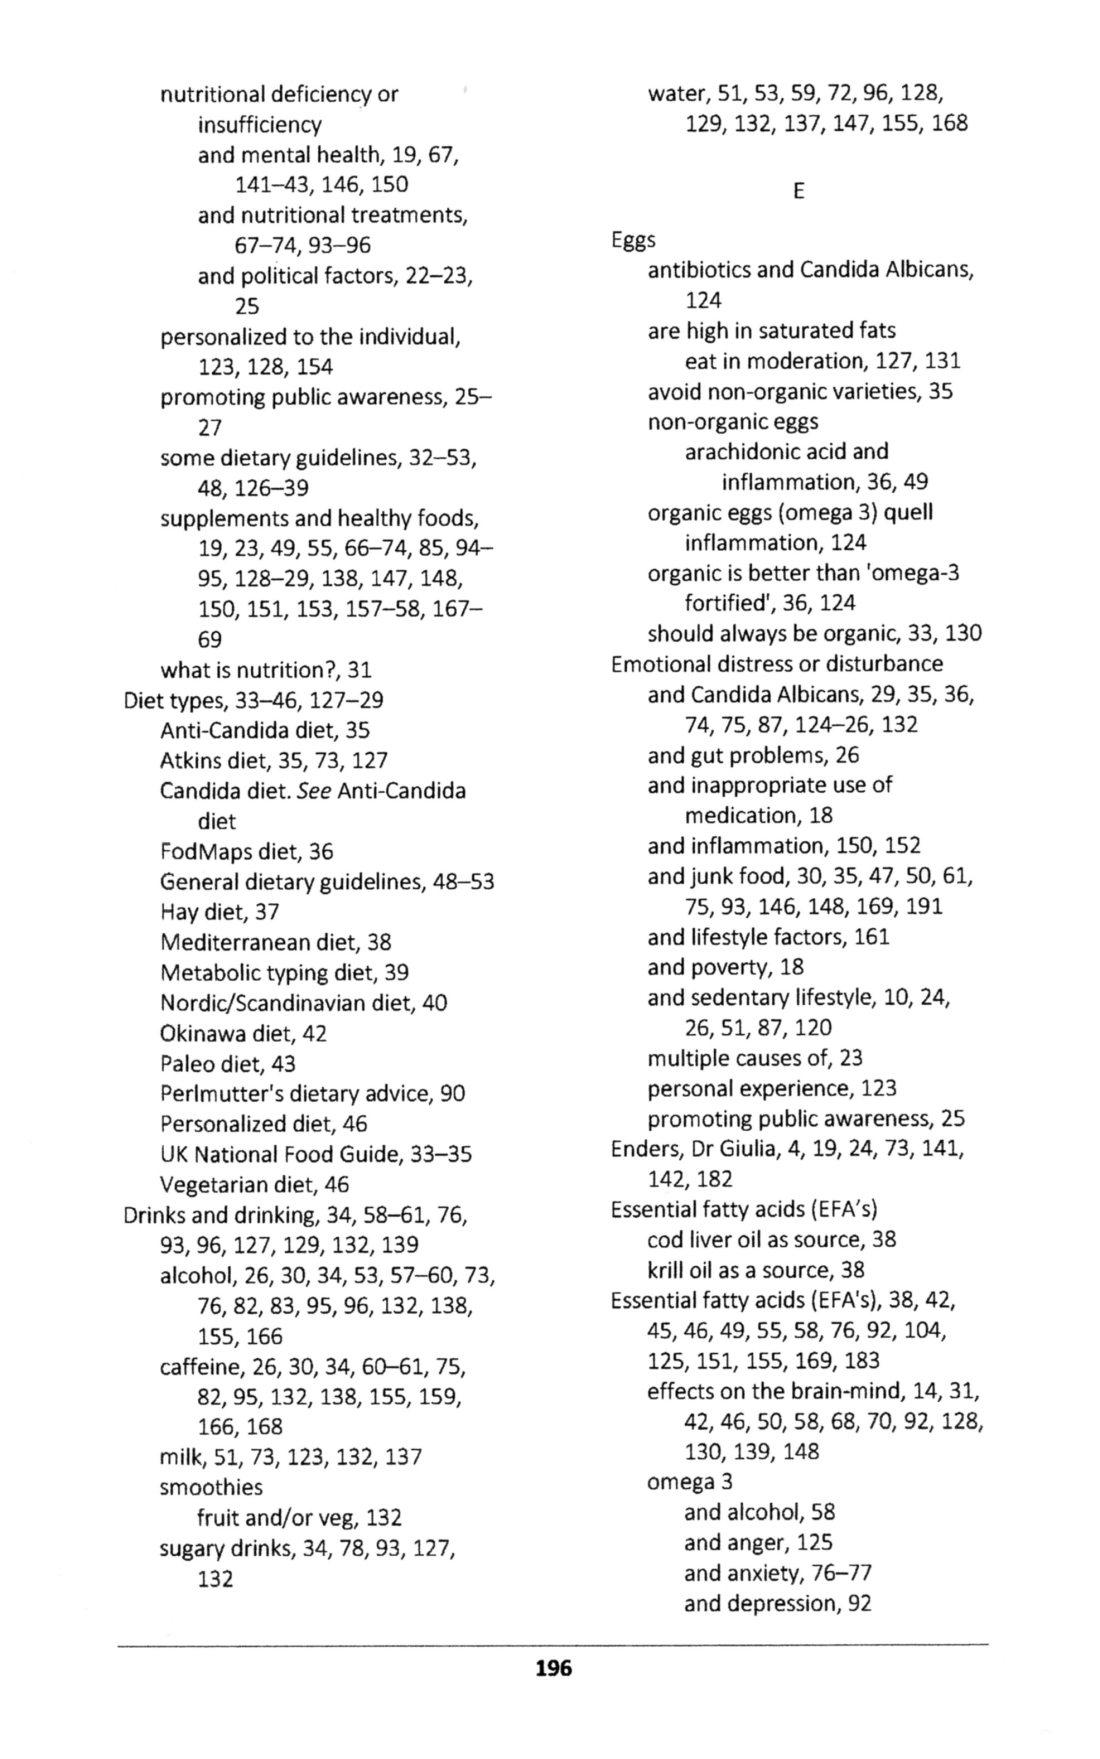 Index extracts003.jpg